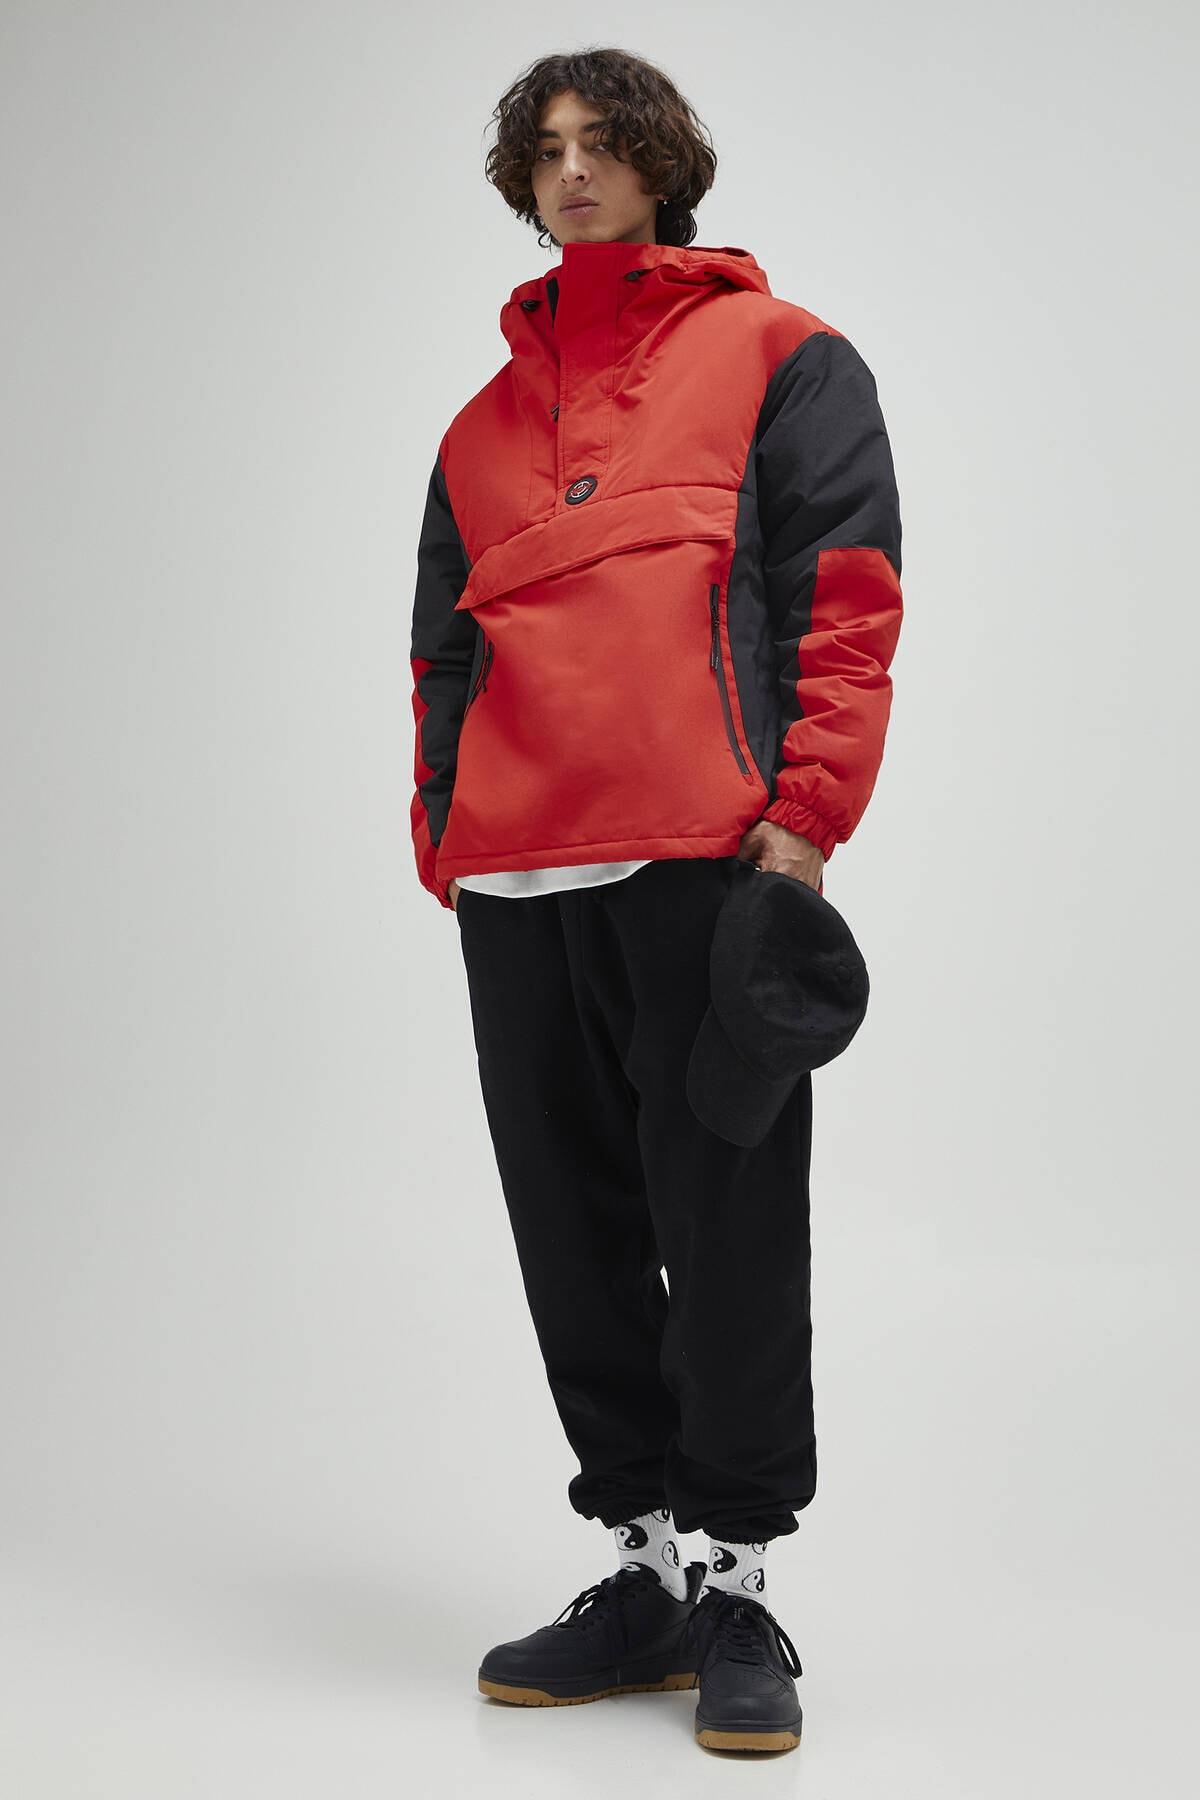 Pull & Bear Erkek Kırmızı Logolu Fermuarlı Kanguru Mont 09710526 2